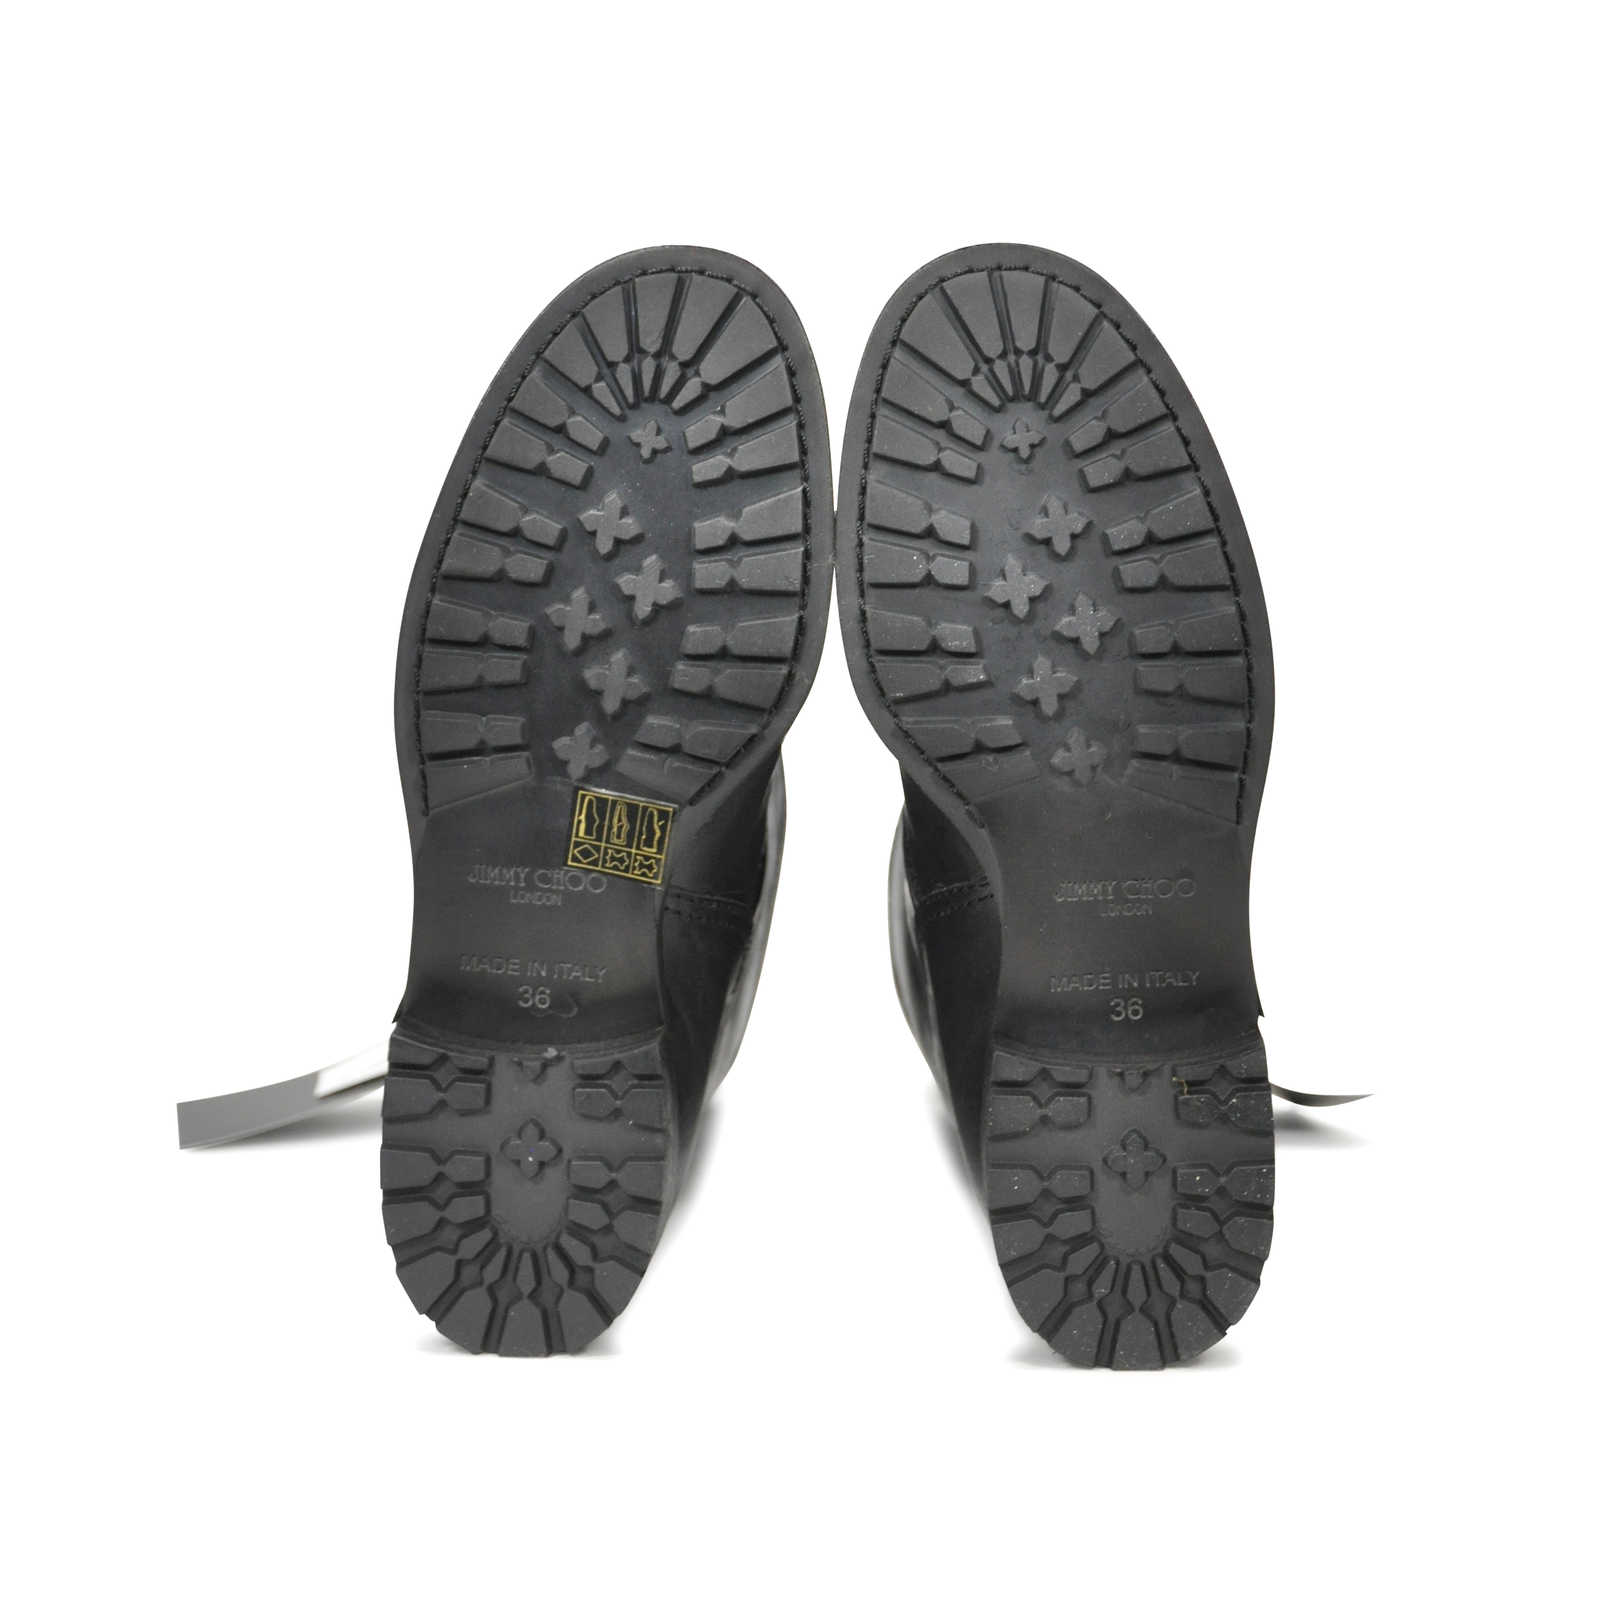 7167dd72f88 ... Authentic Second Hand Jimmy Choo Biker Rabbit Fur Leather Boots  (PSS-183-00063 ...